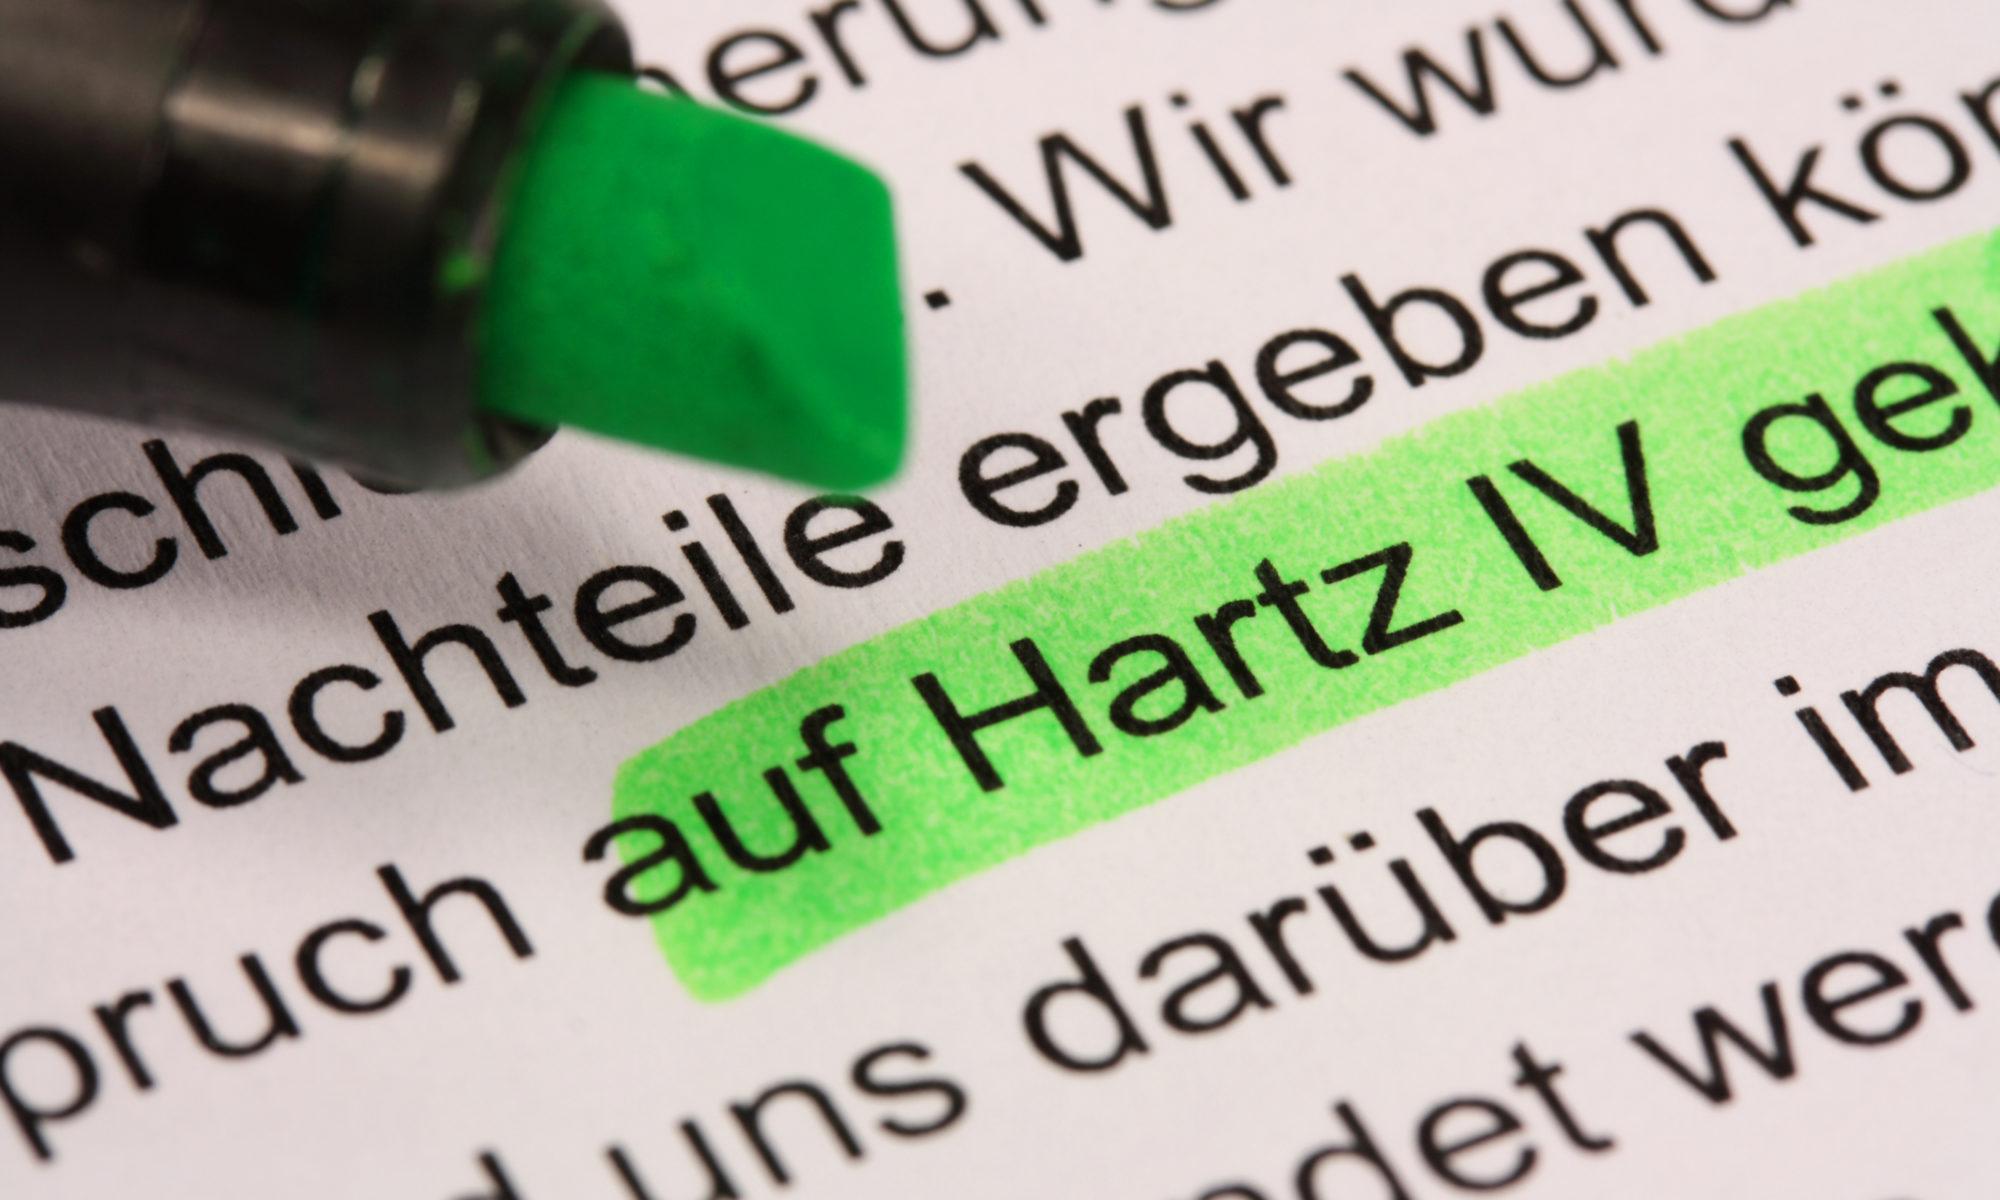 AdobeStock 23201460 2000x1200 - Hartz IV: Achtung Übernahme aller Mieten!